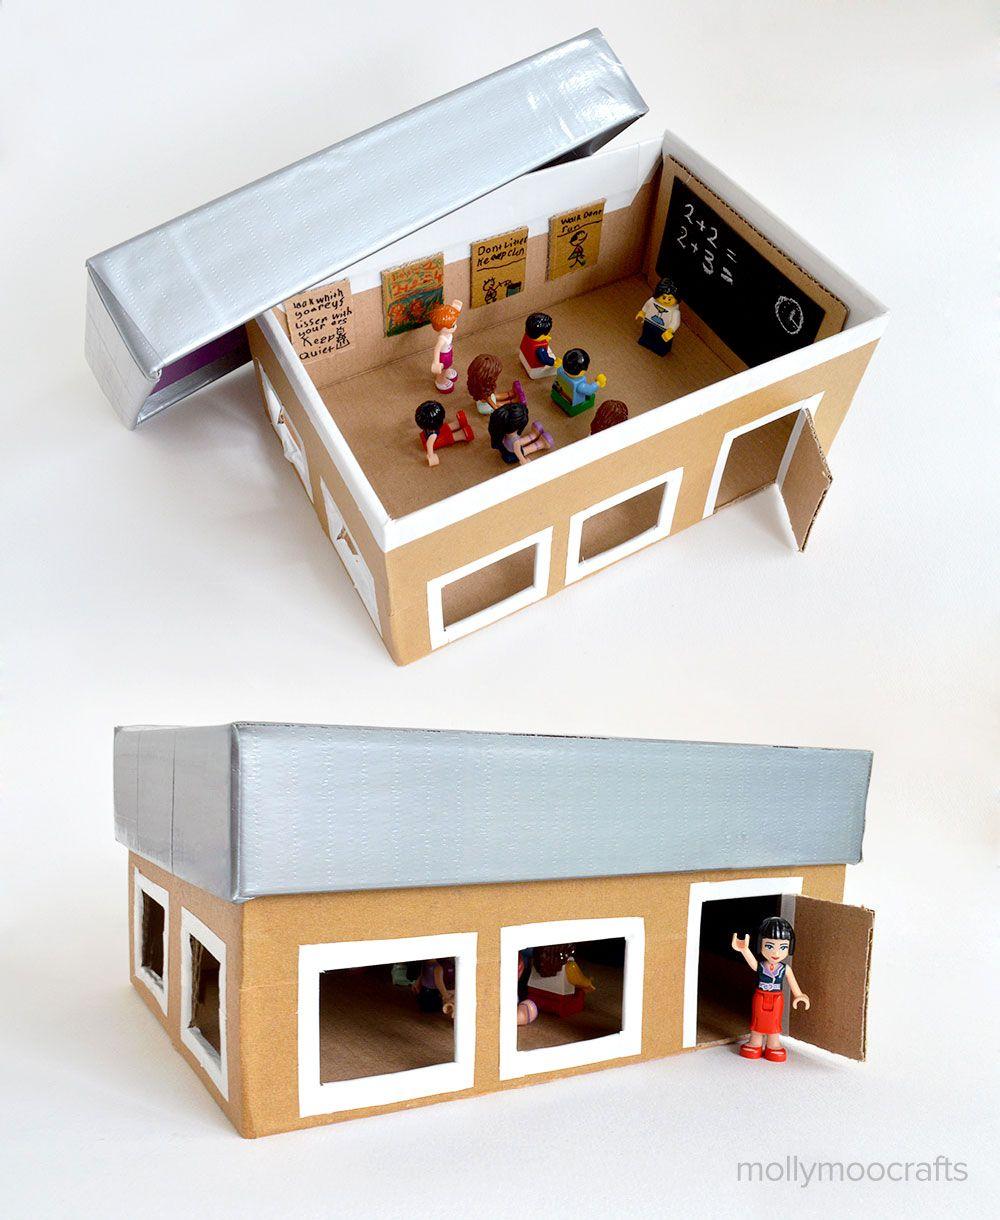 Shoebox house school project